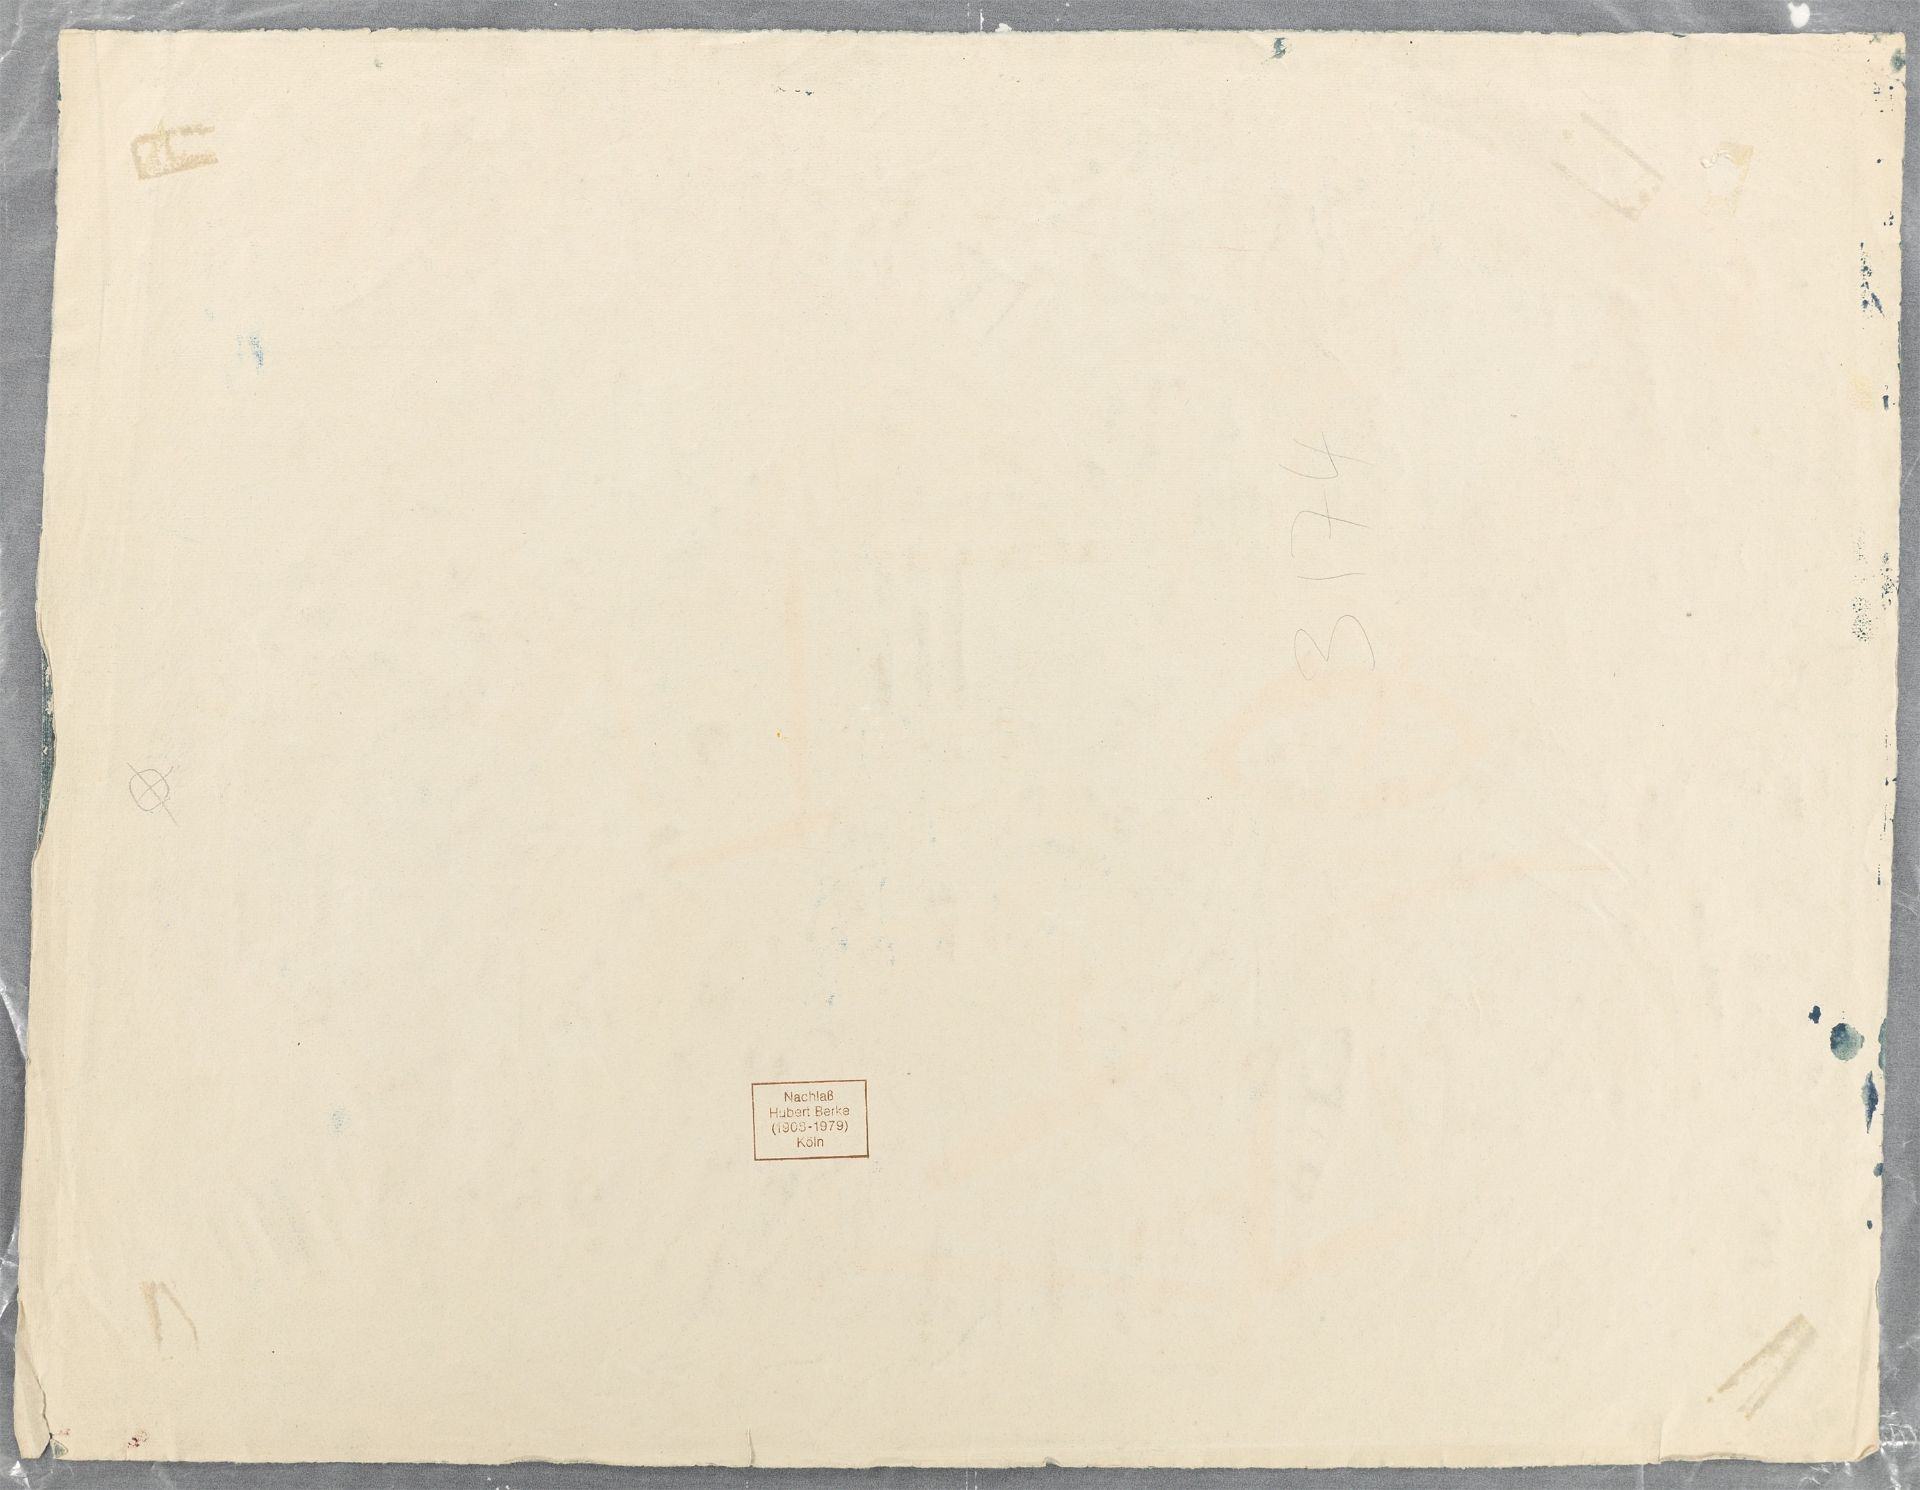 Los 1126 - Hubert Berke (Buer/Westfalen 1908 – 1979 Rodenkirchen b. Köln)